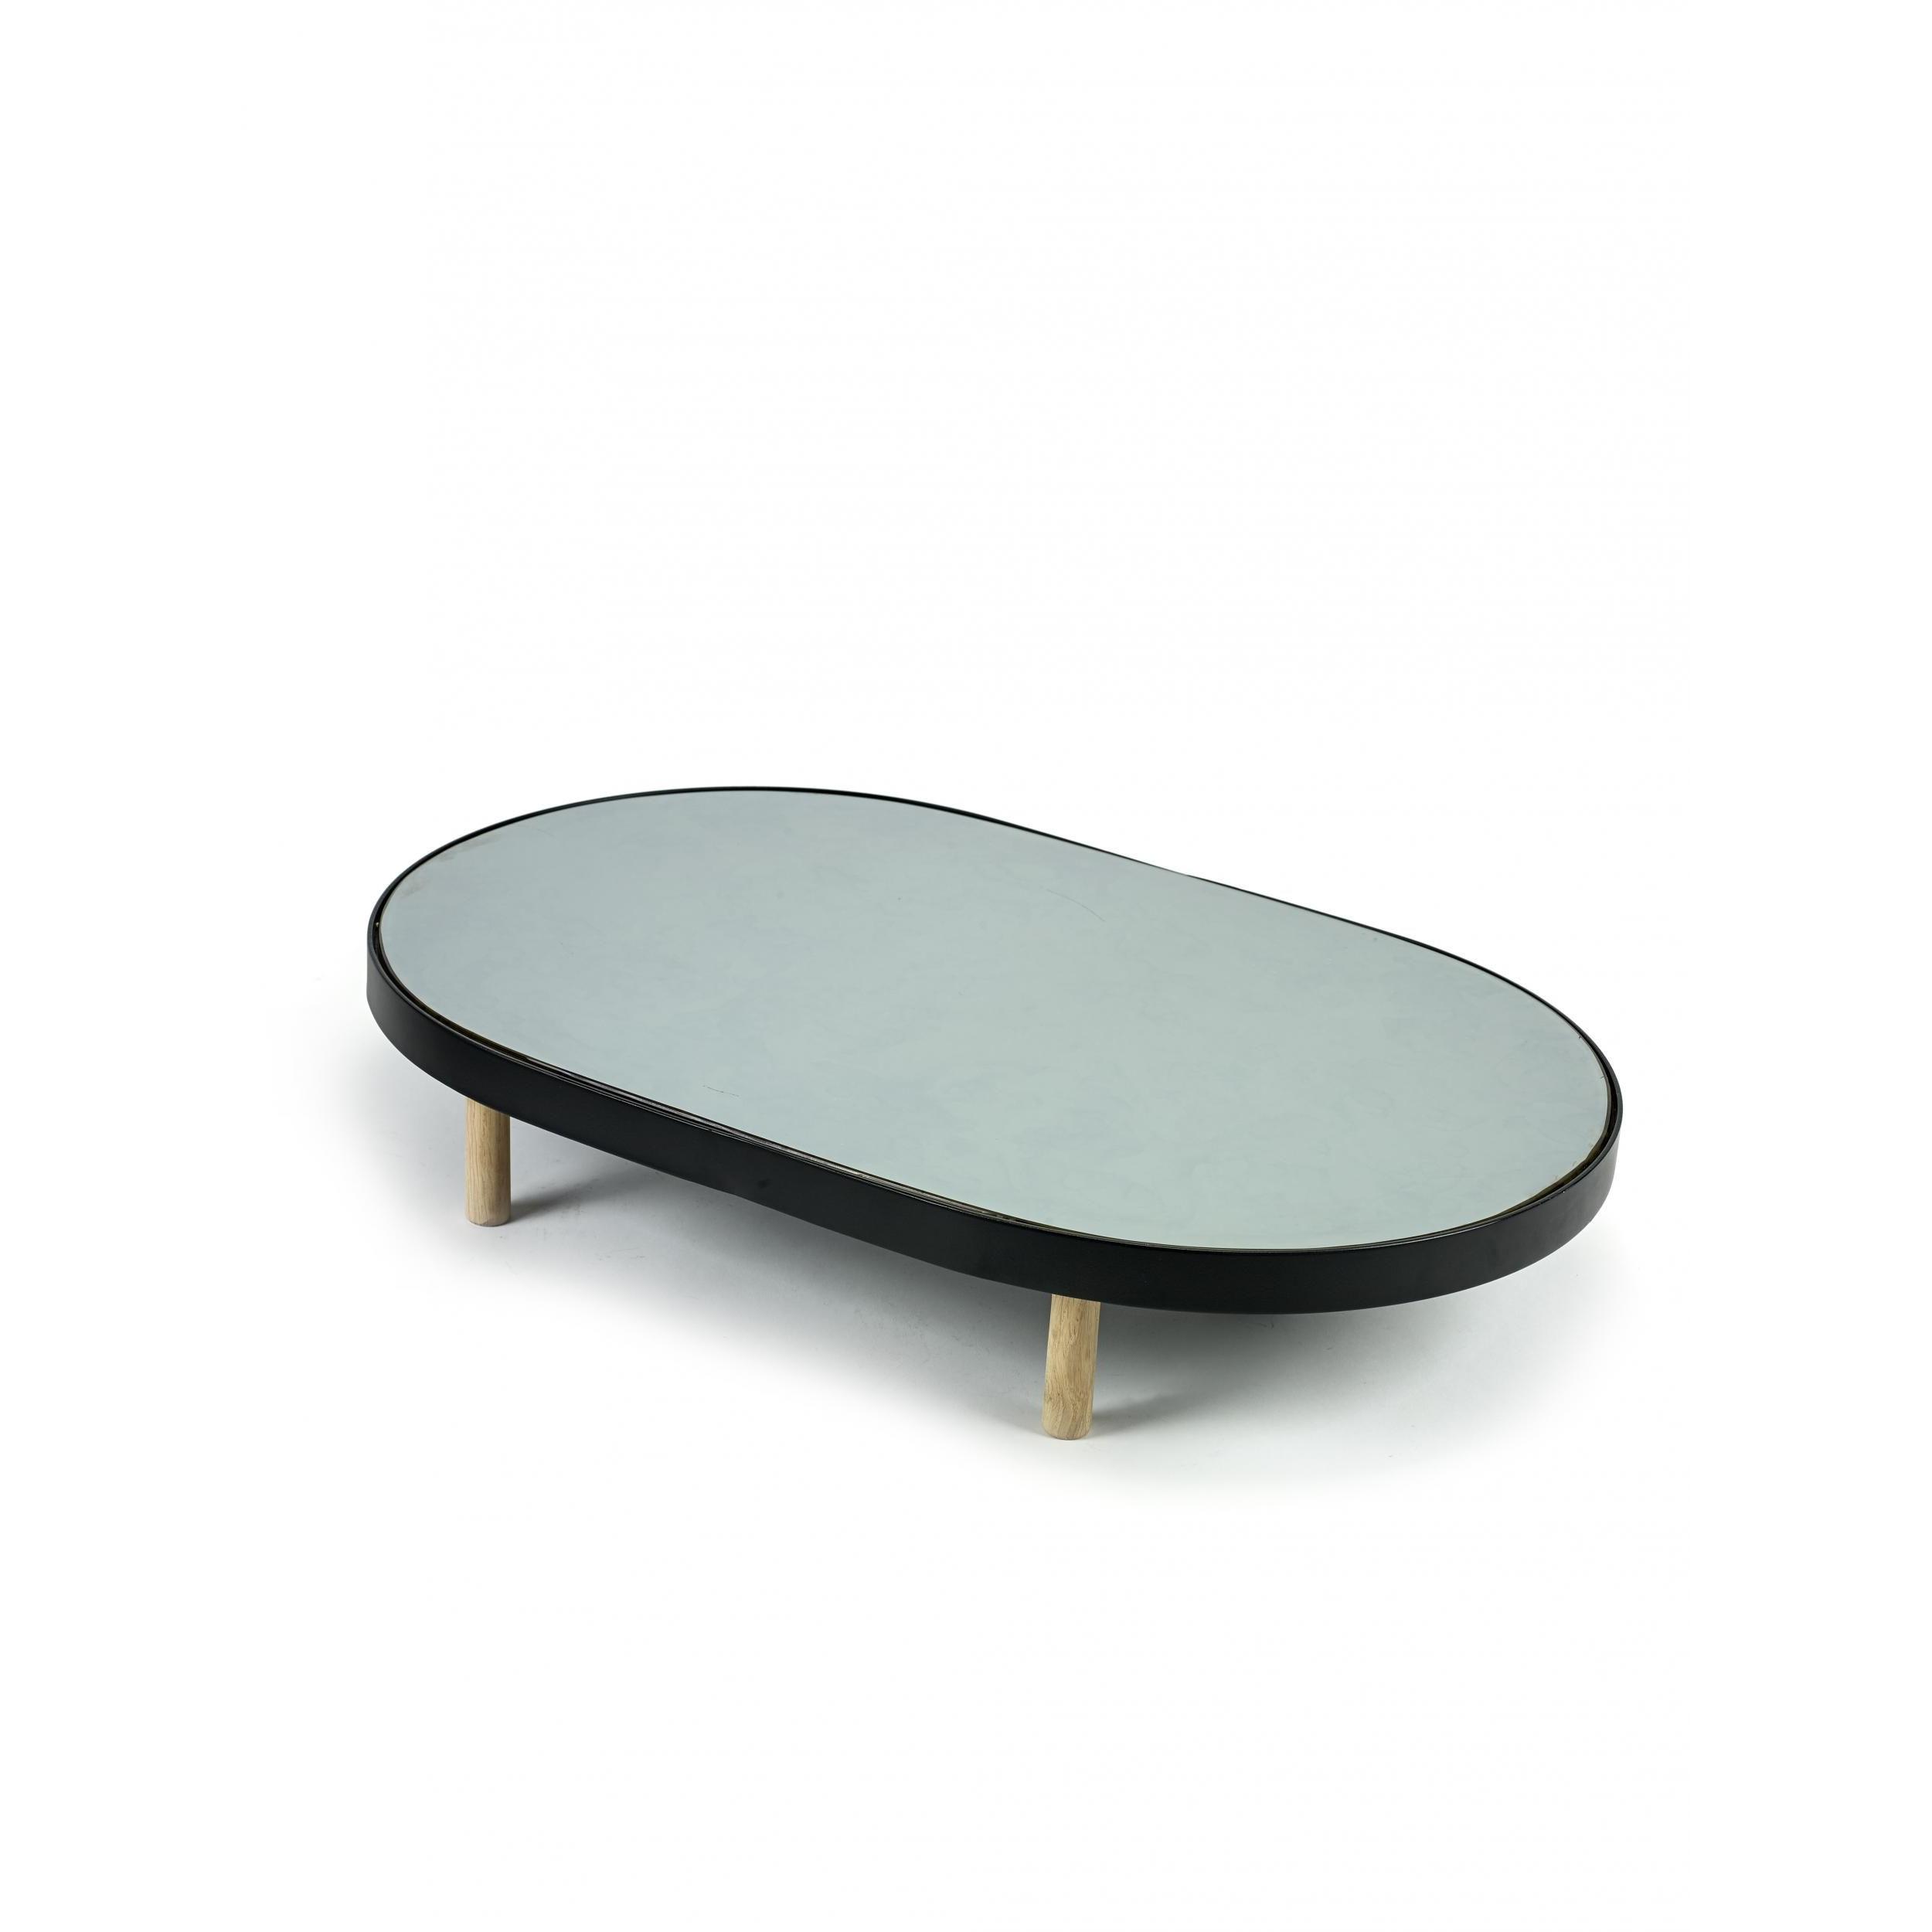 Studio Simple Mirror Tray Oval 67 cm | Schwarz